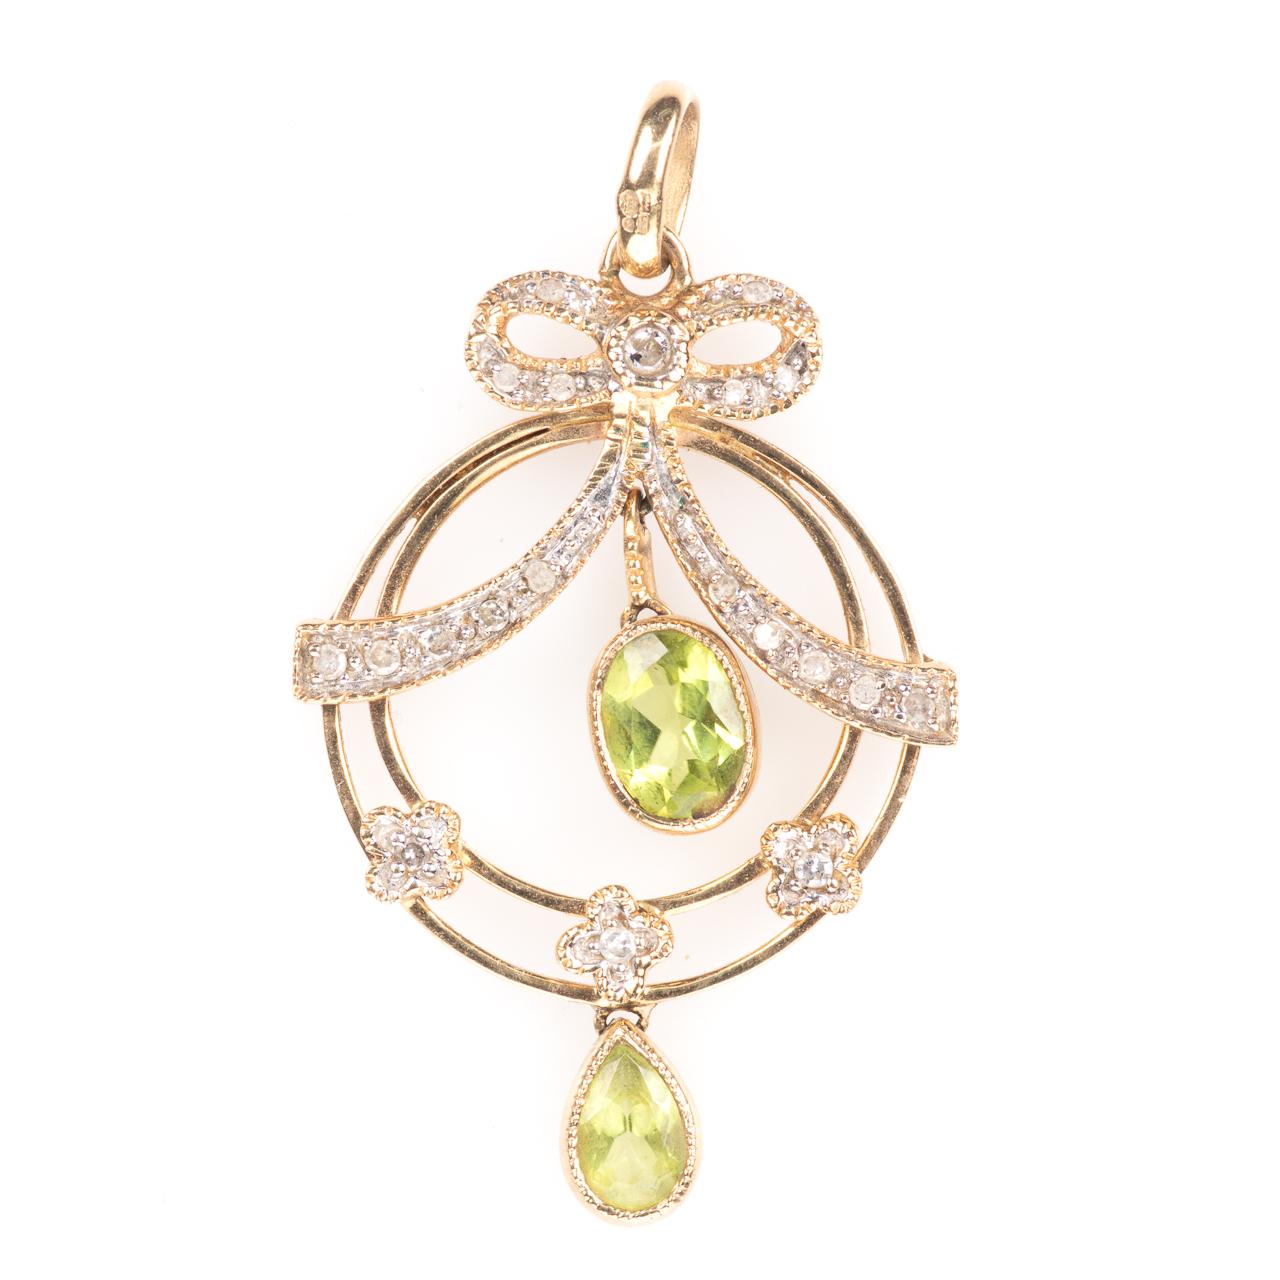 9ct Gold Art Nouveau Peridot & Diamond Pendant